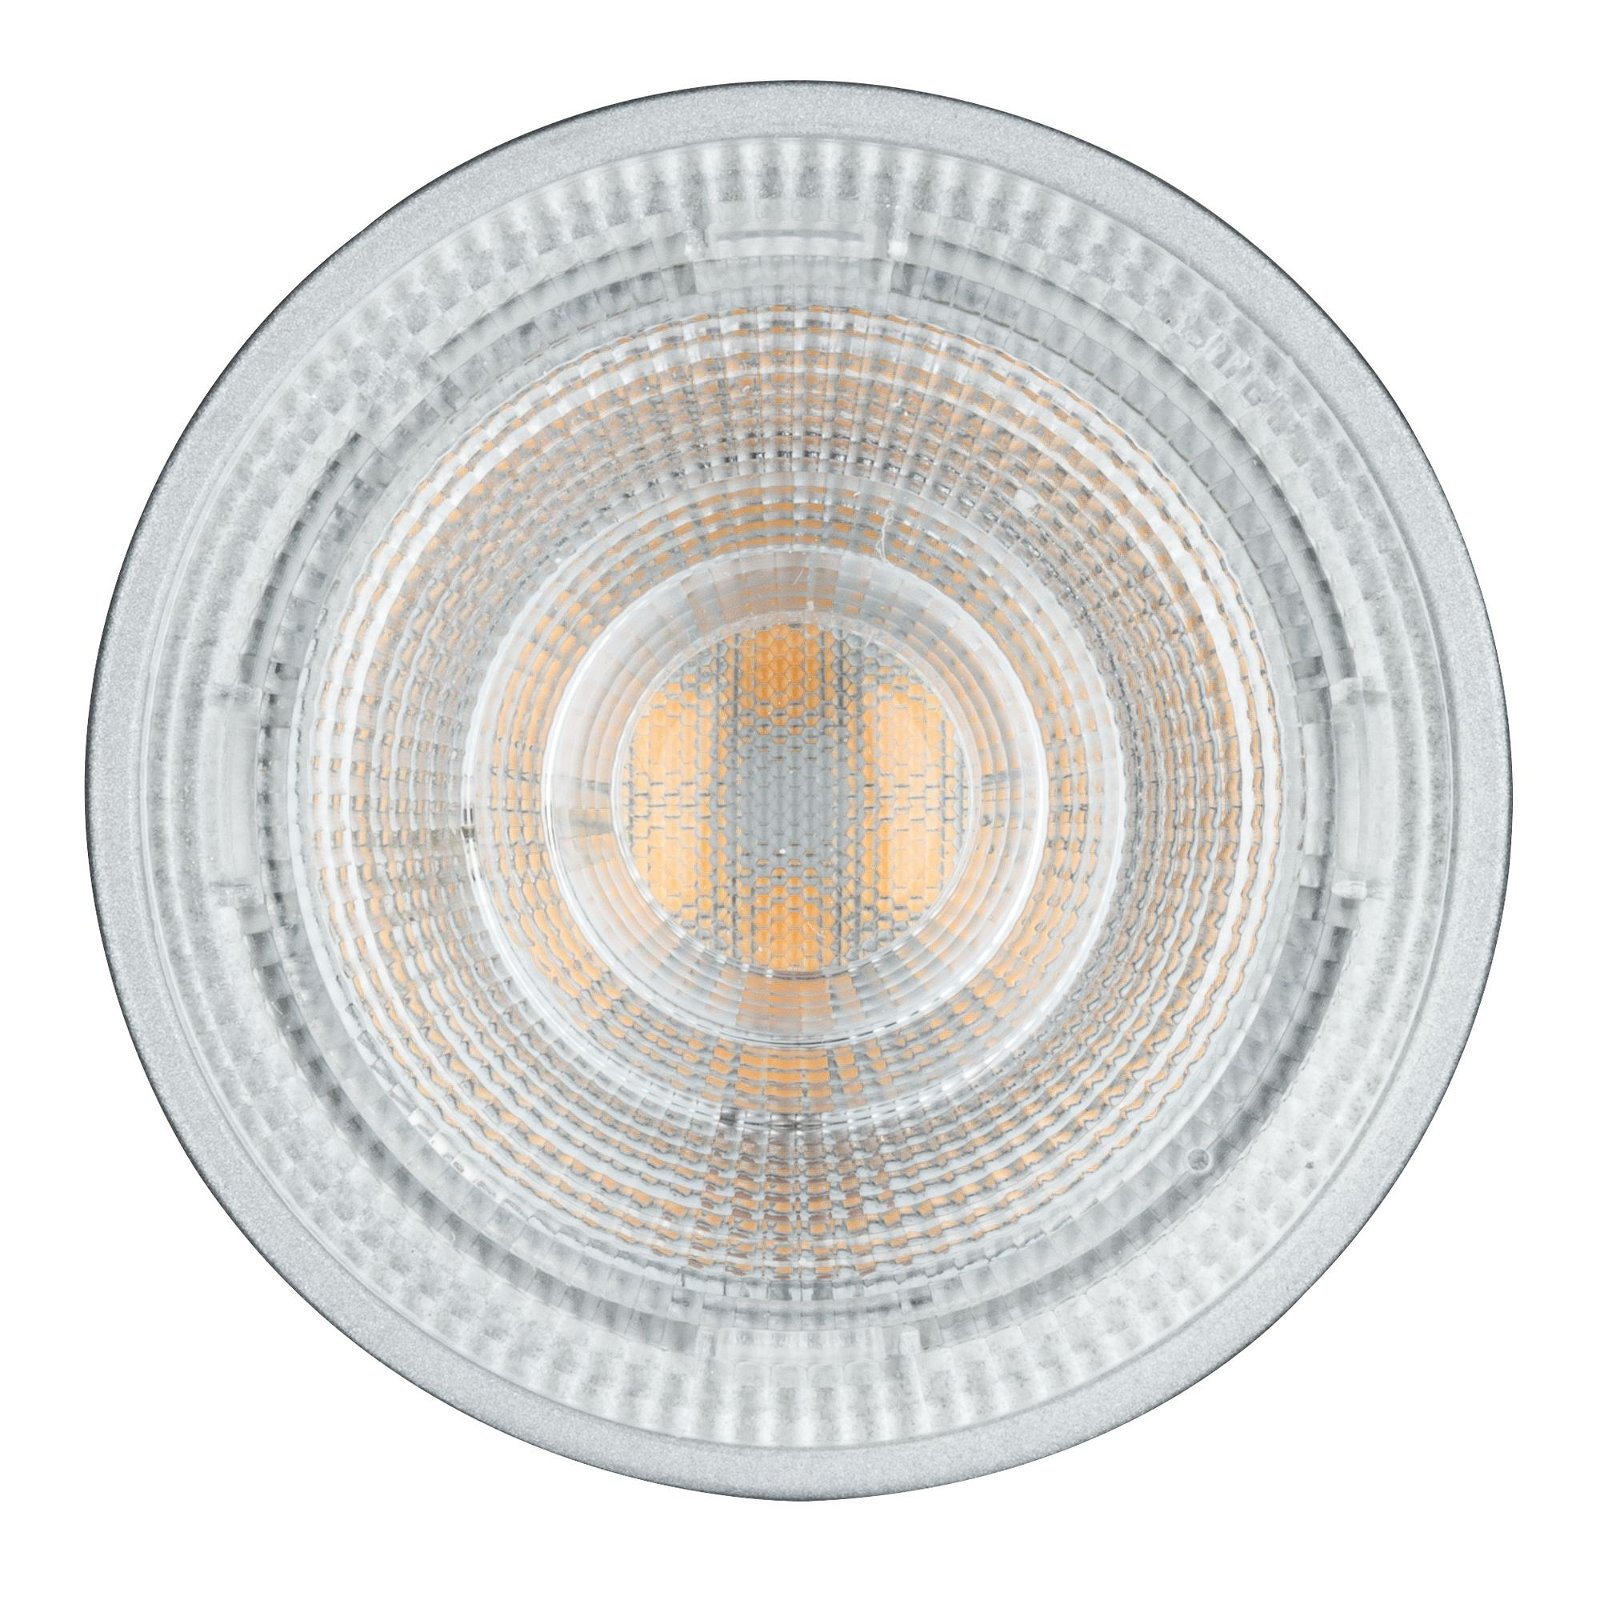 LED Reflektor GU5,3 12V 345lm 4,5W 2700K Alu